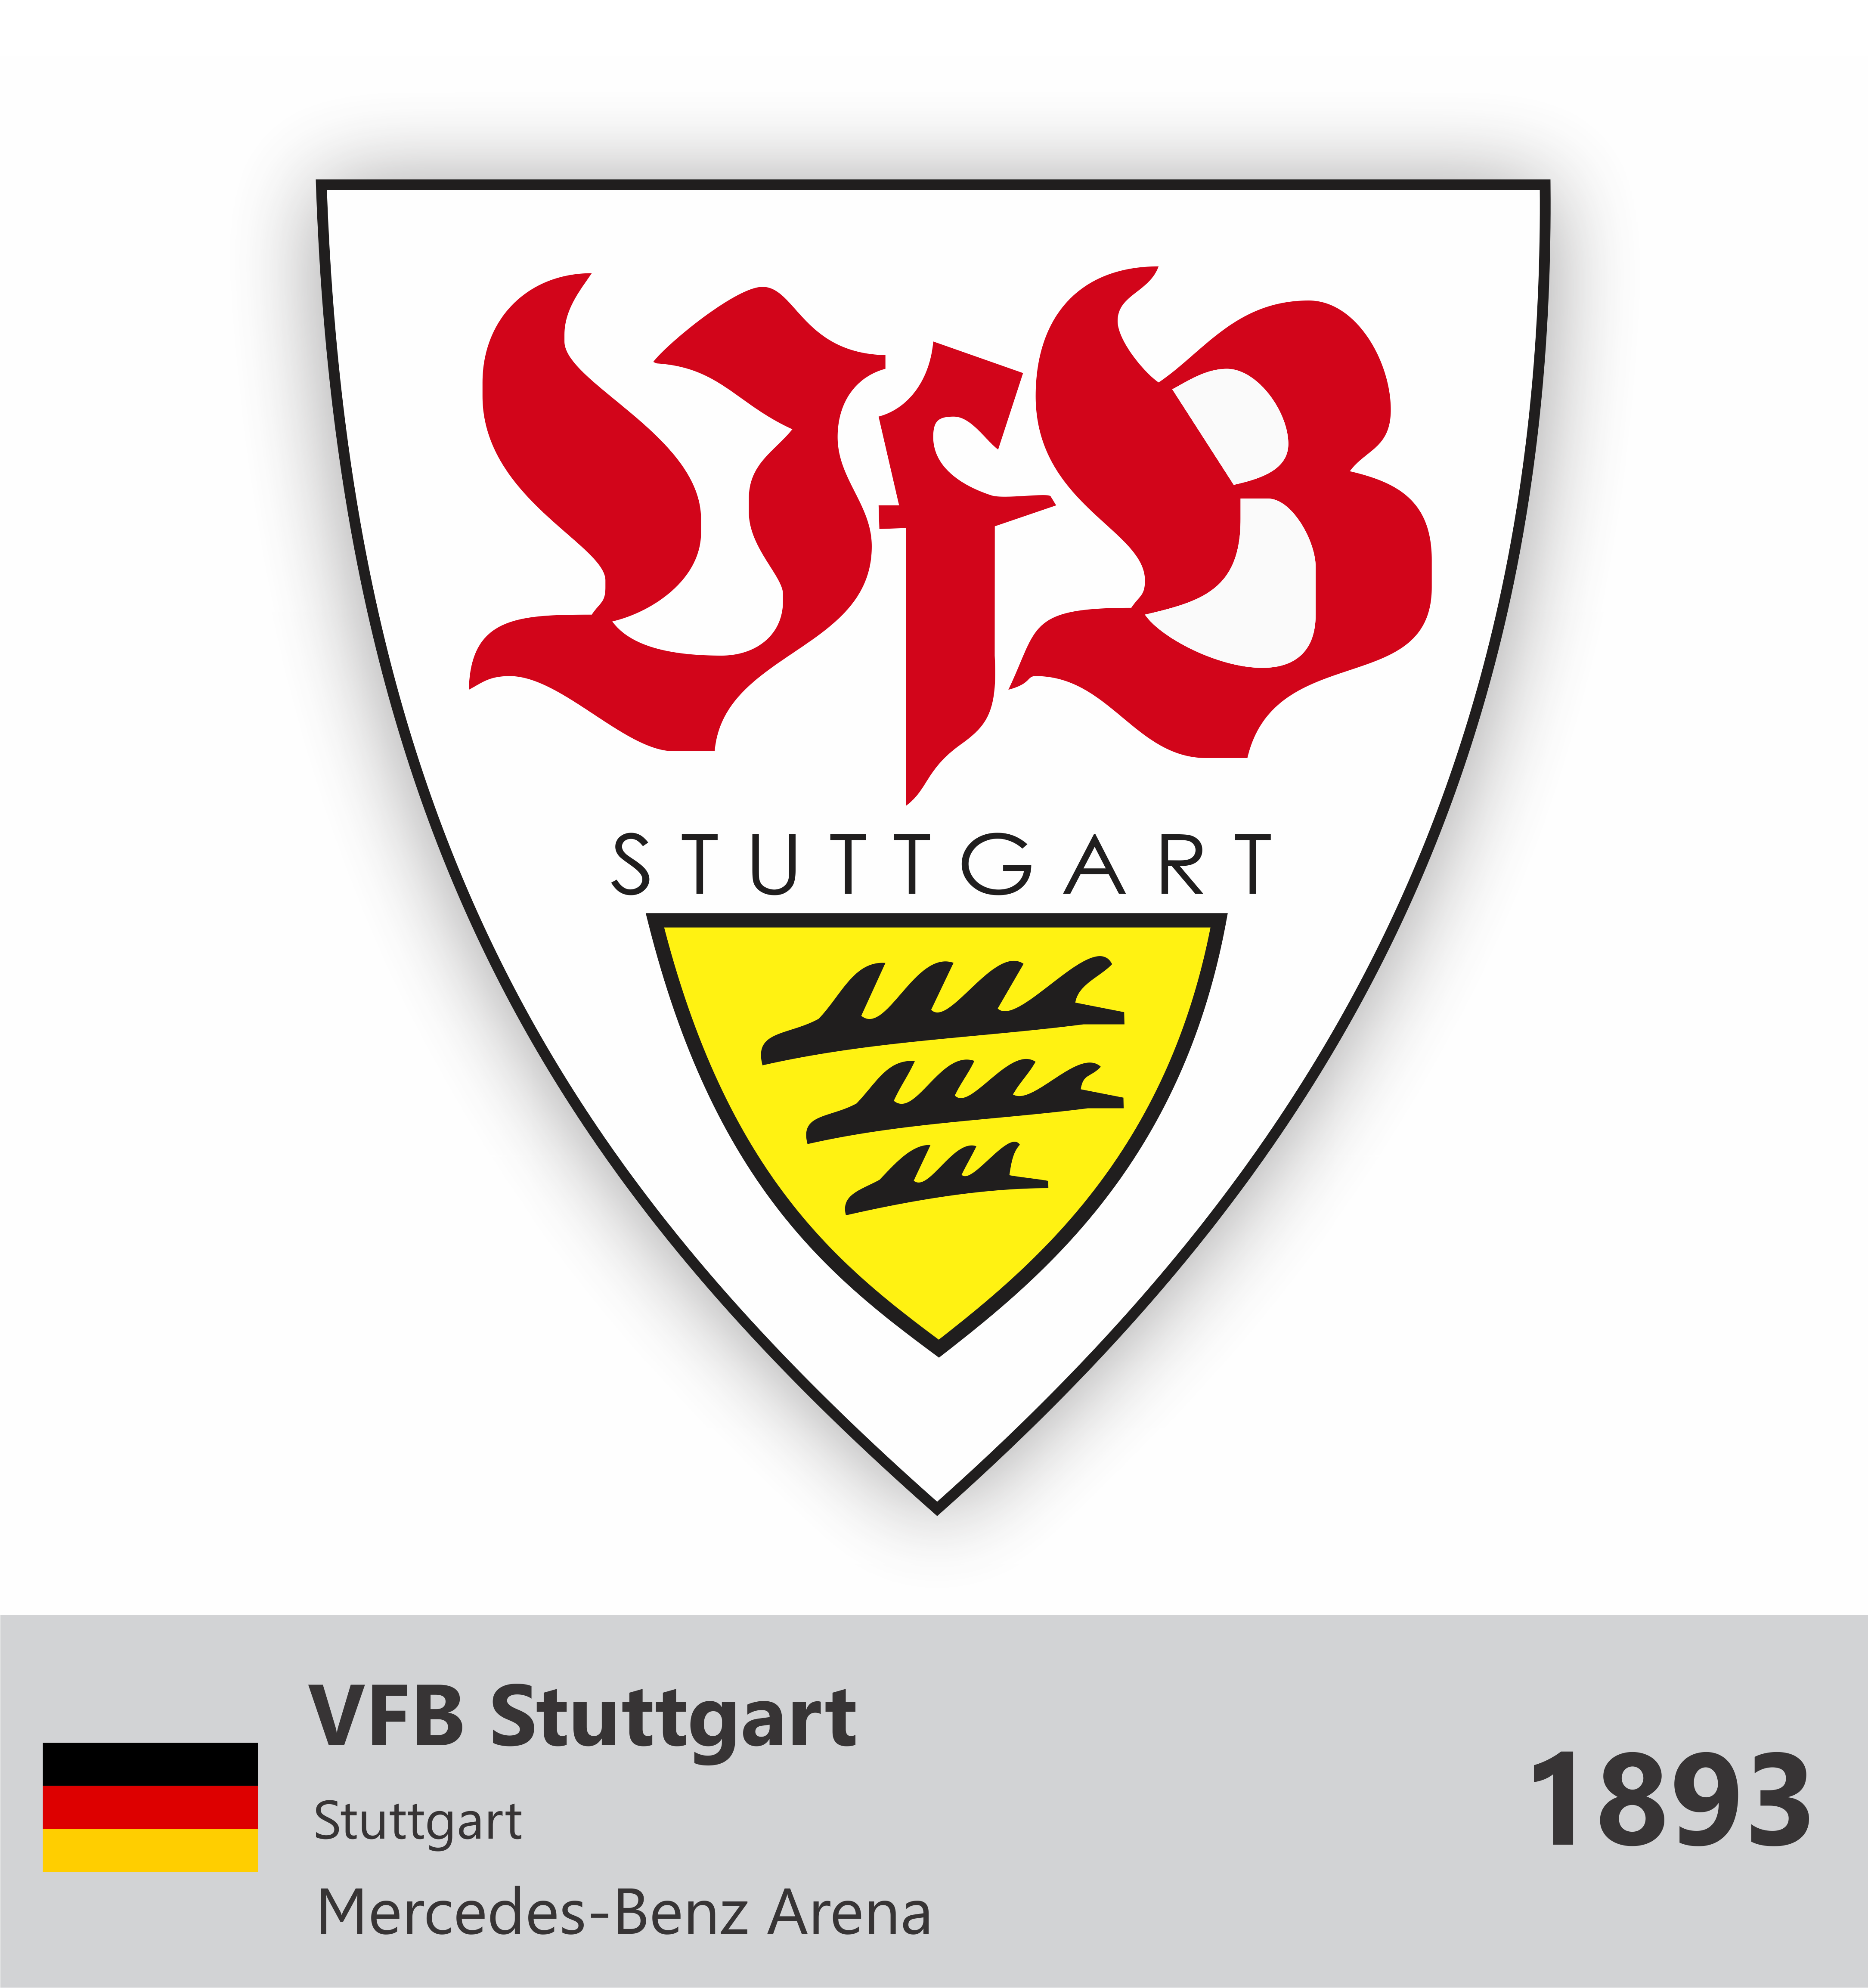 Vfb Stuttgart Vfb Stuttgart Vfb Stuttgart Logo Vfb